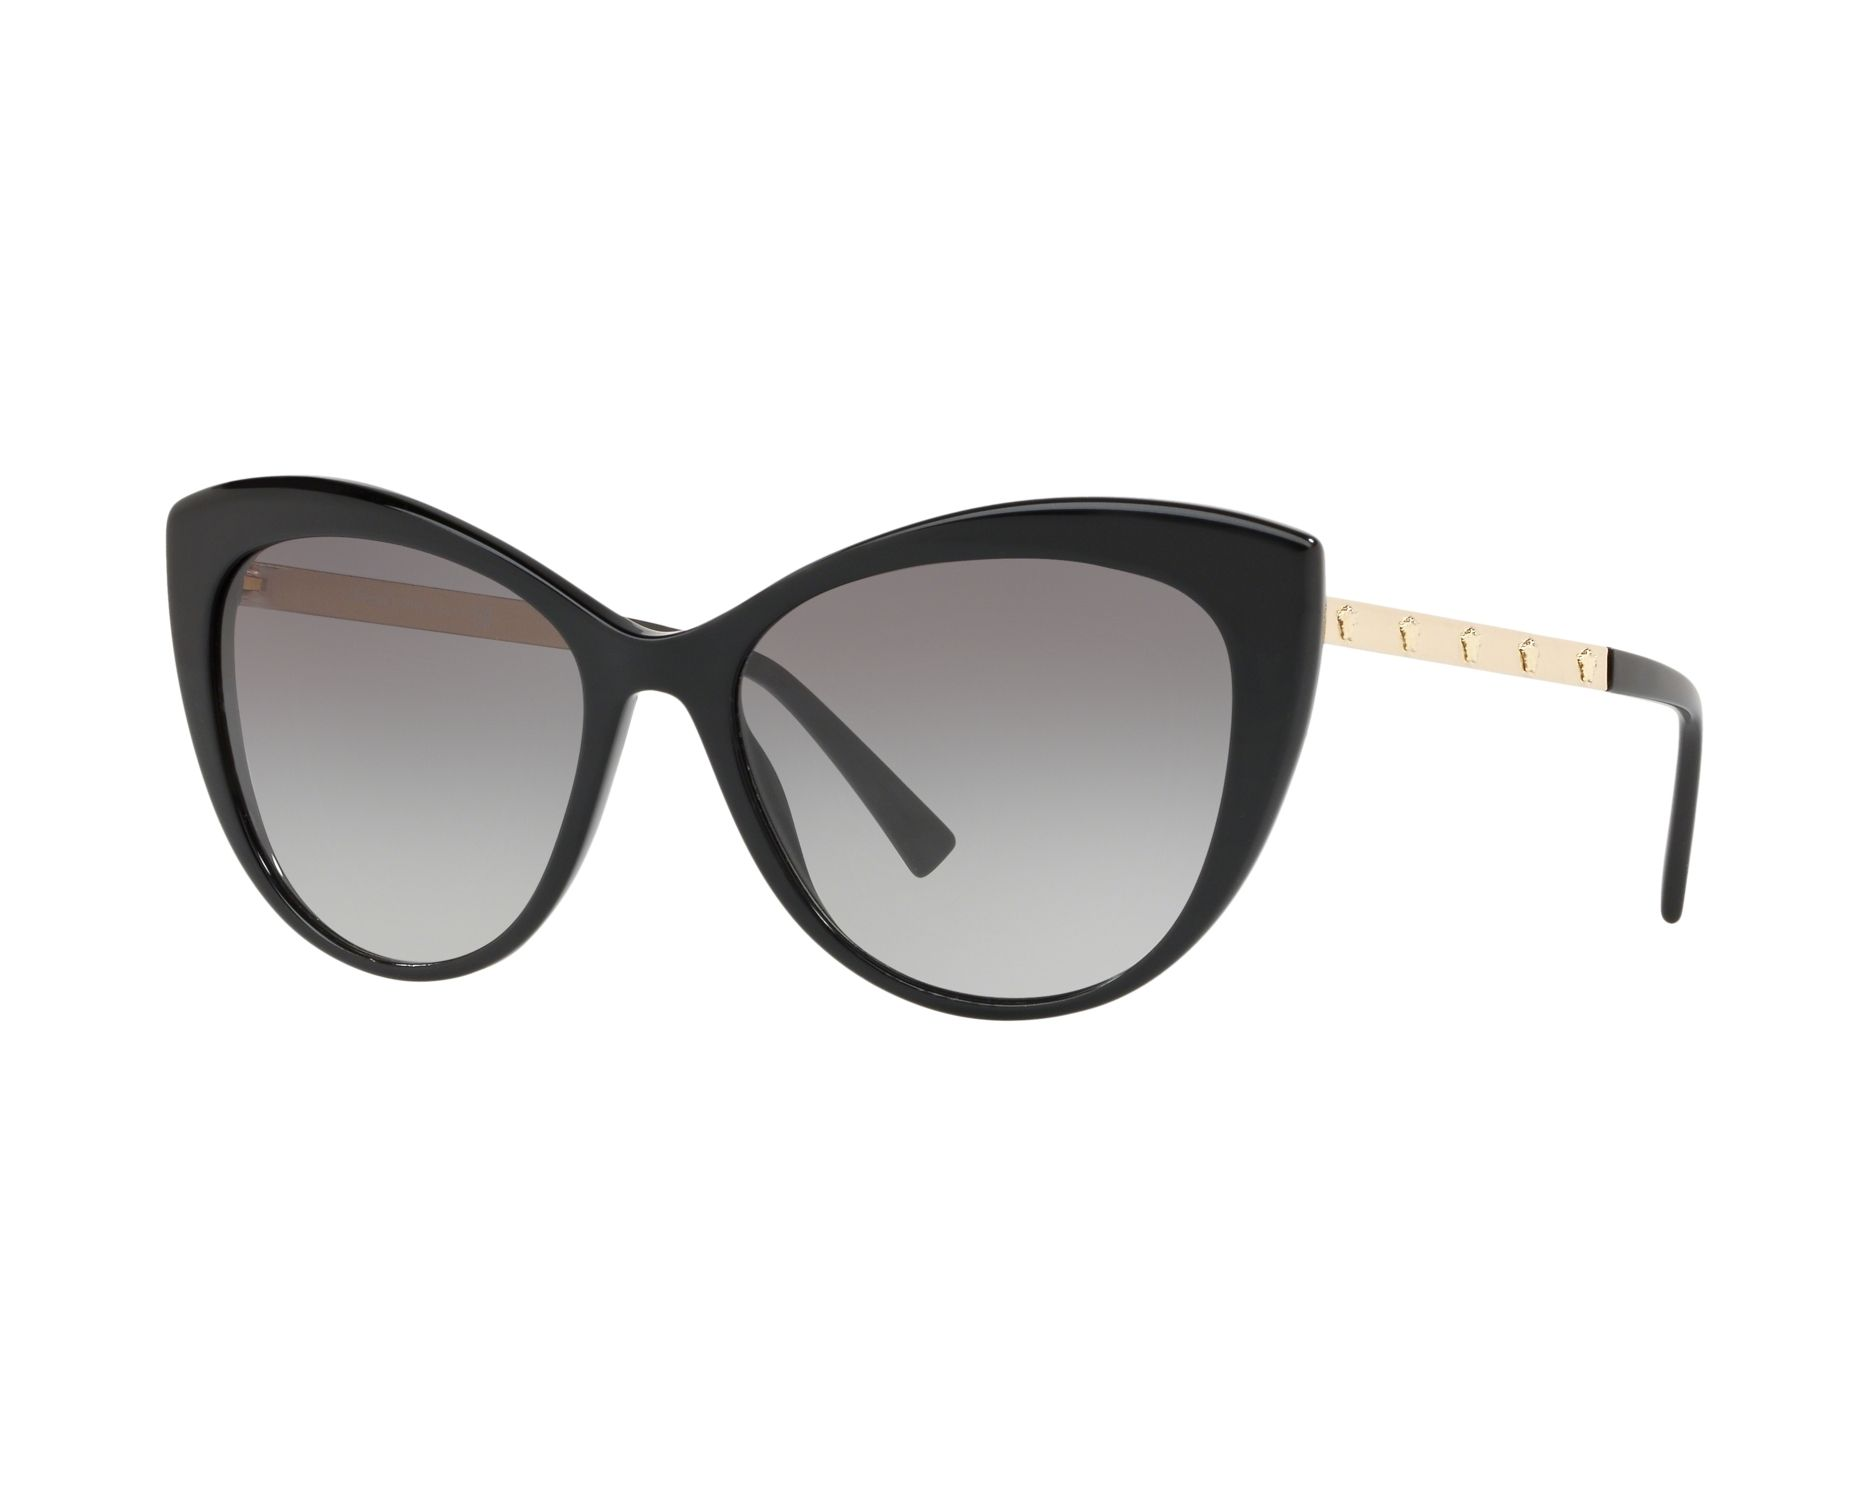 c0a28008e0 Gafas de sol Versace VE-4348 GB1/11 57-17 Negra Oro